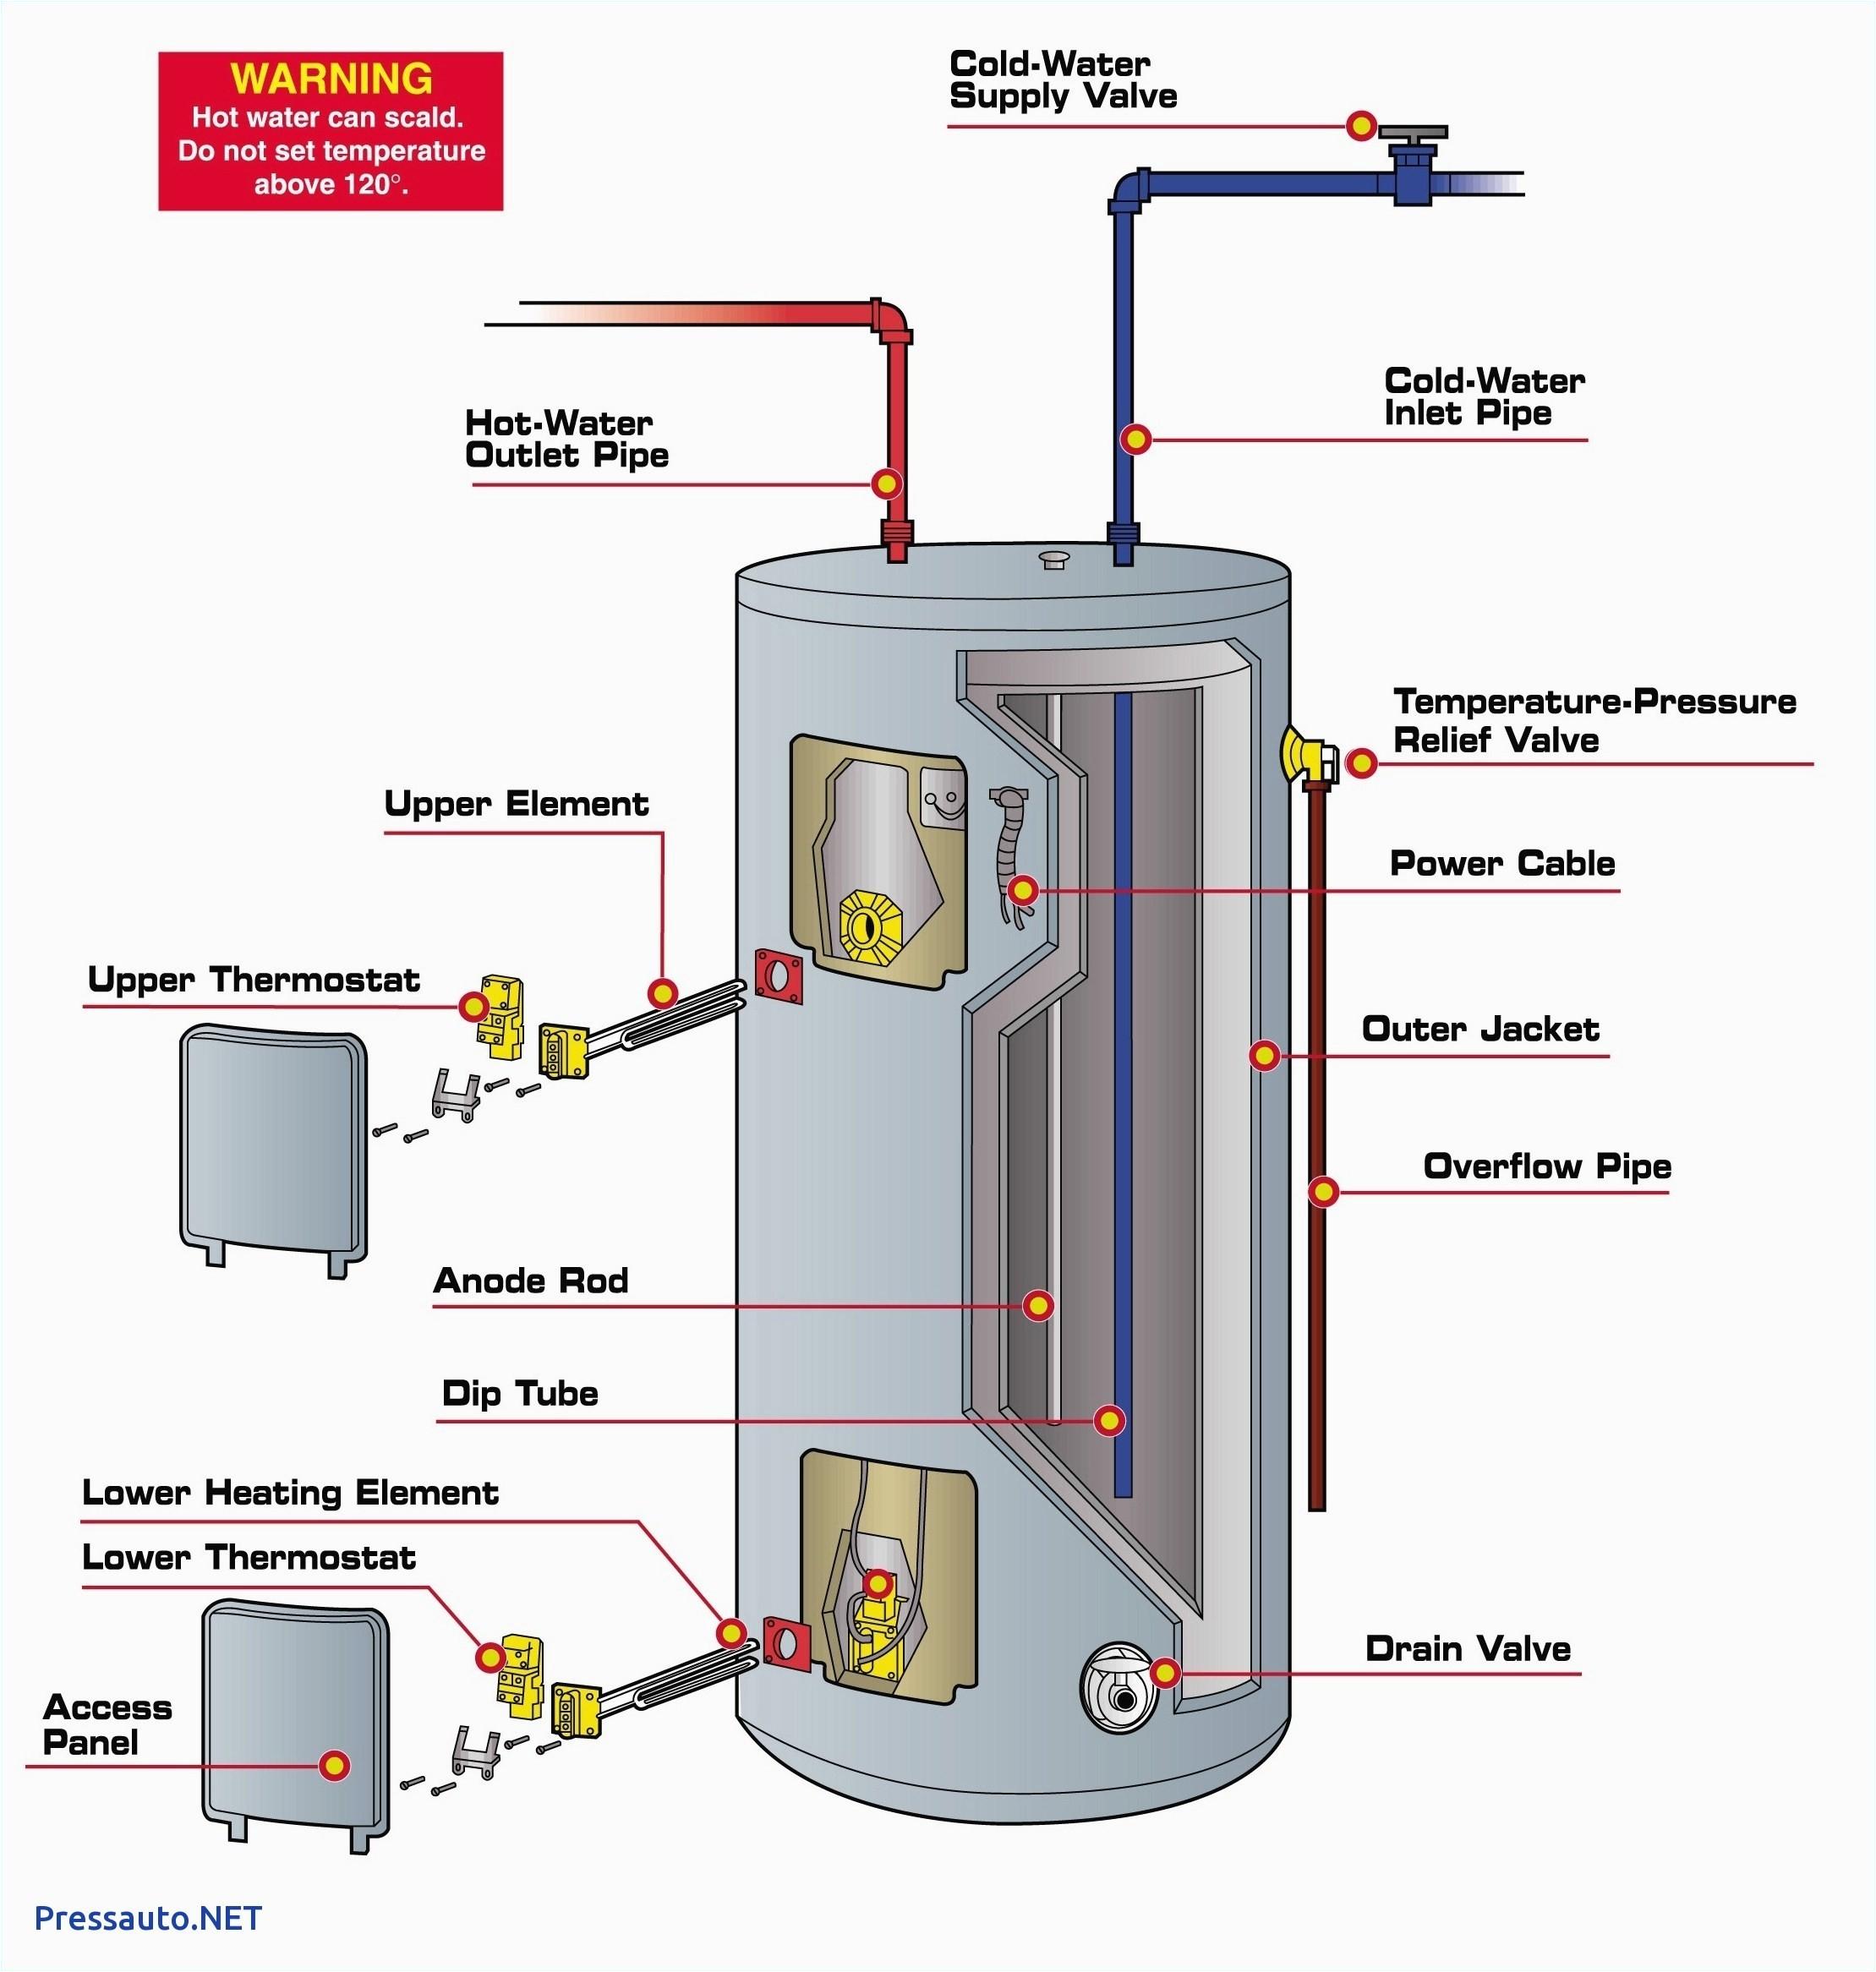 Electric Hot Water Heater Wiring Diagram B Ower Heater Wiring Diagram Schema Diagram Database